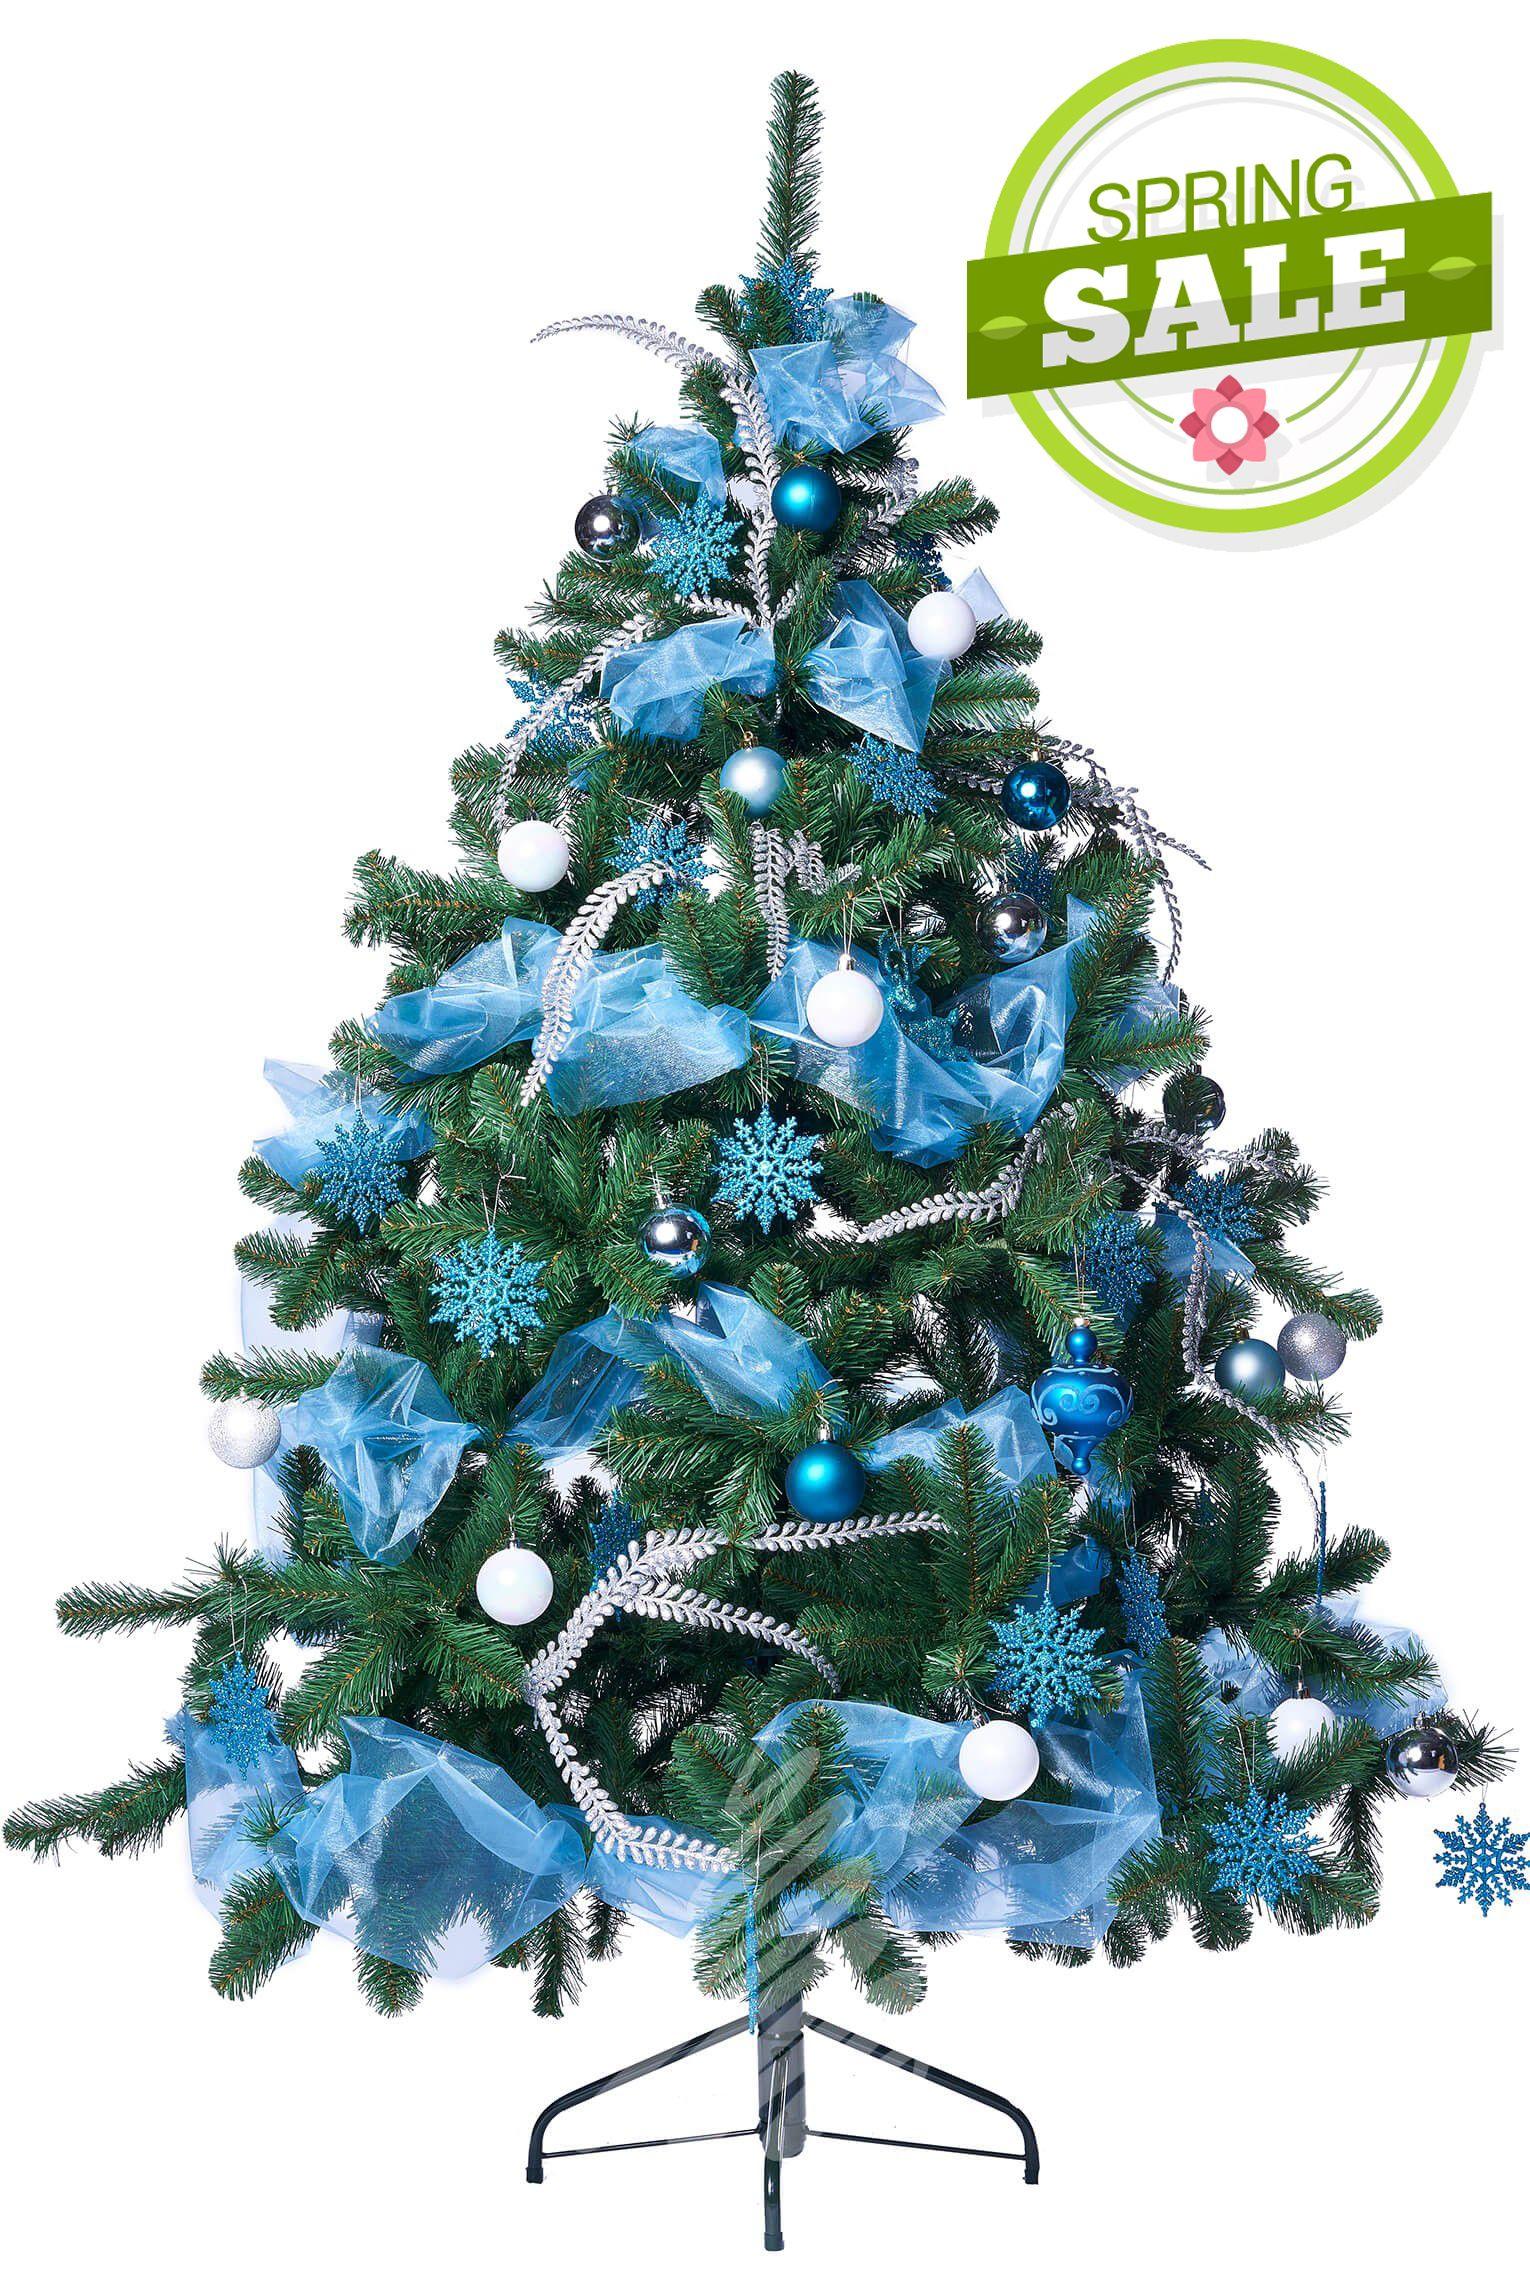 SpringSale - Norway Spruce 6ft #Christmas Tree - http://www ...